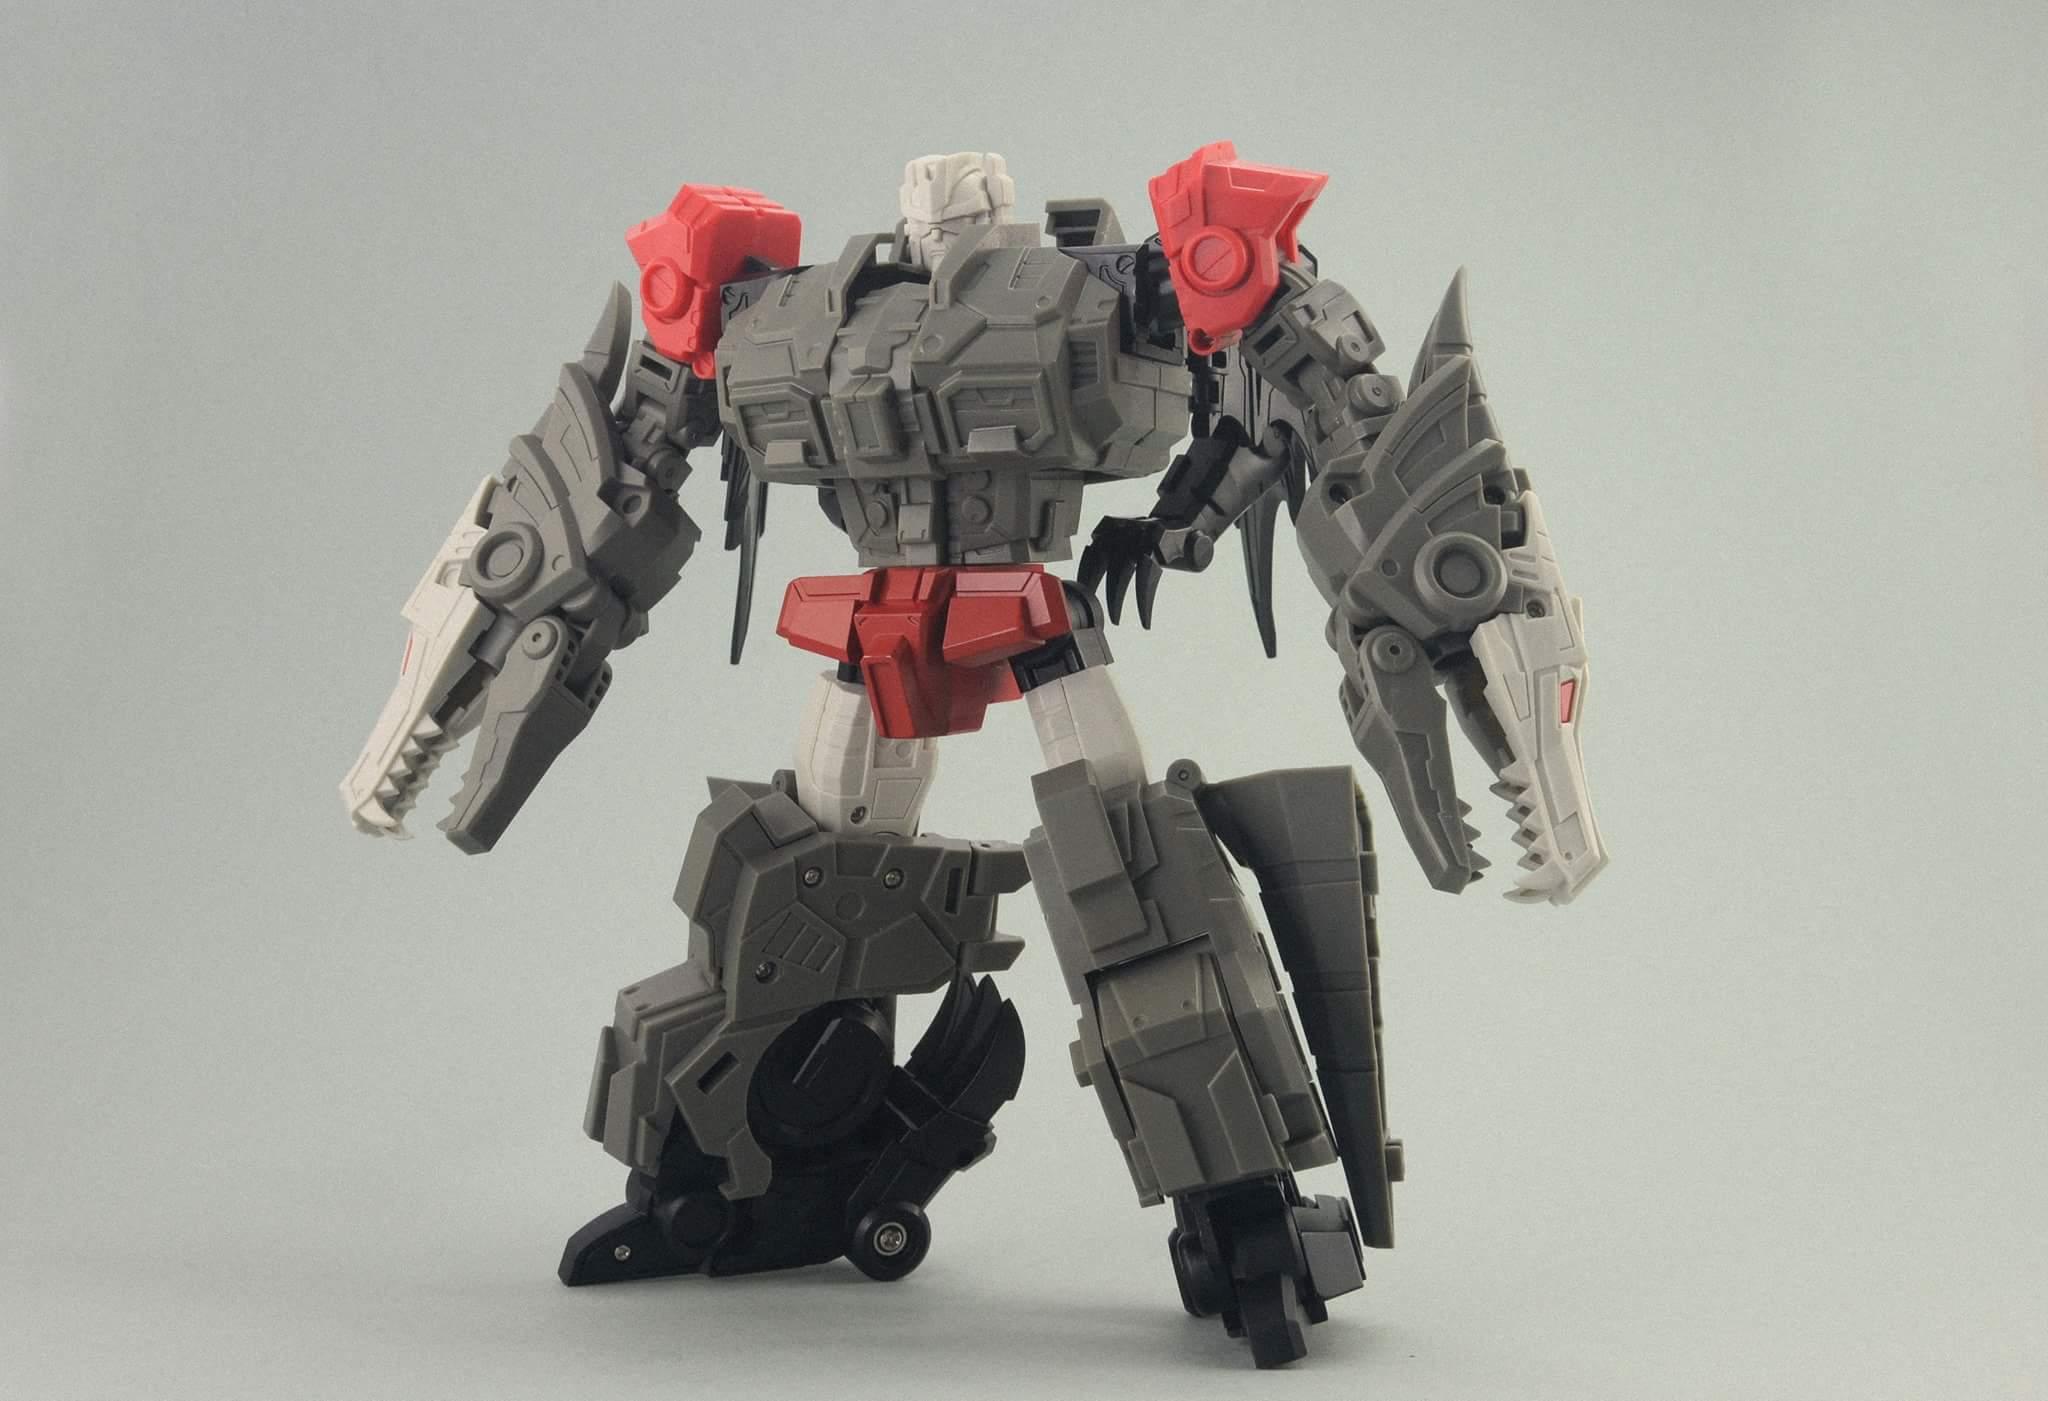 [FansHobby] Produit Tiers - Master Builder MB-02/03/05 - aka Monsterbots/Monstrebots - Page 2 PEjuL14O